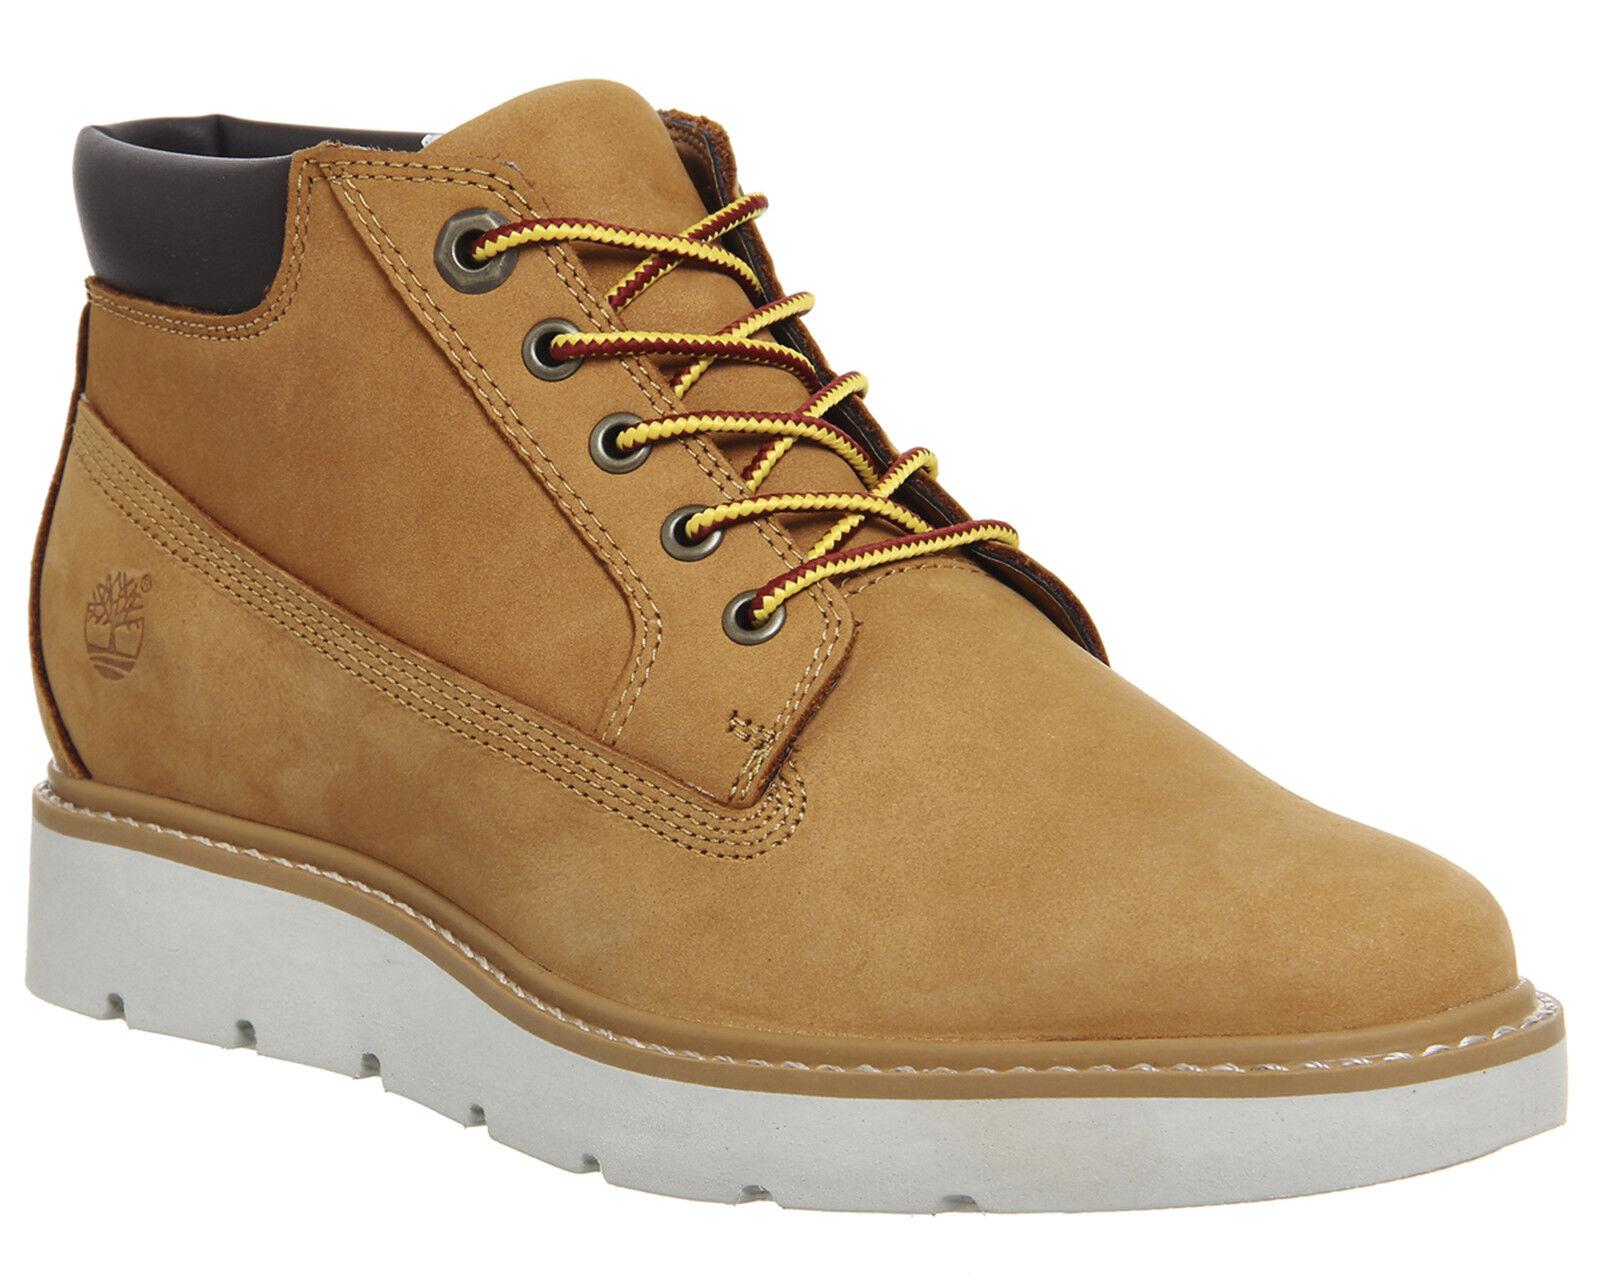 Women's Timberland Kenniston Nellie Wheat  Boots Size: US: 9.5